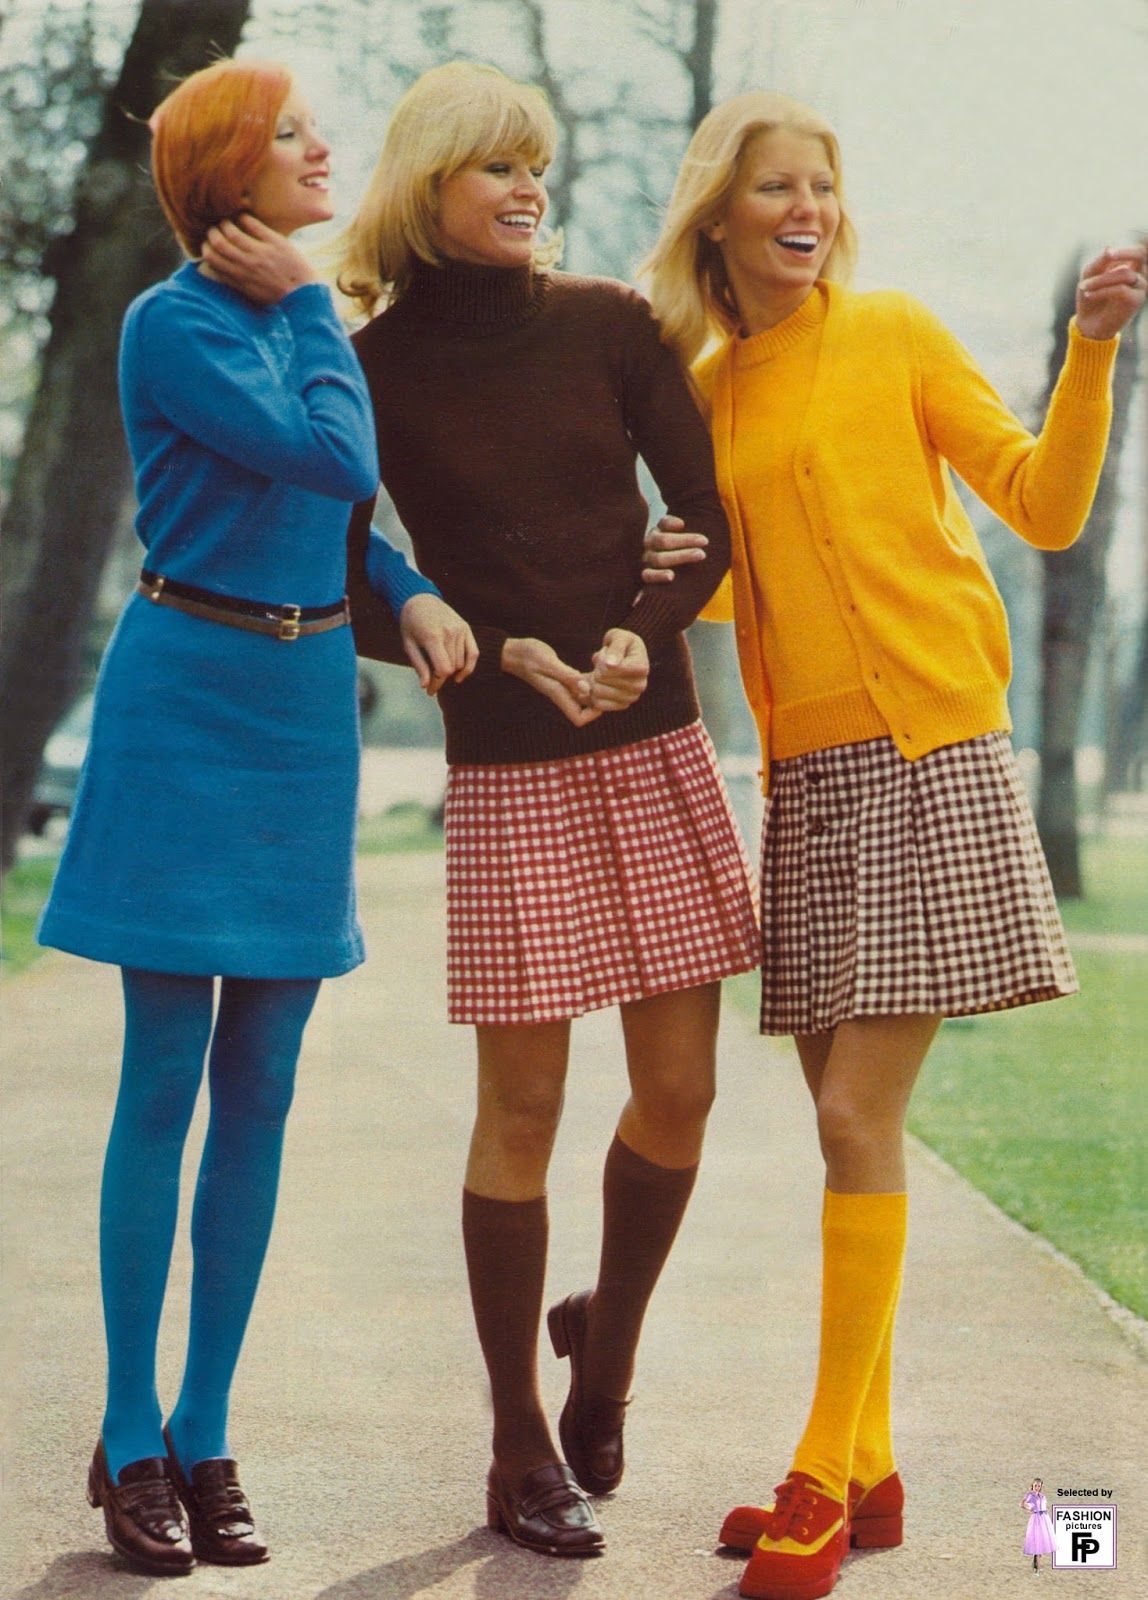 25a9b5c912a1e The 1970s fashion